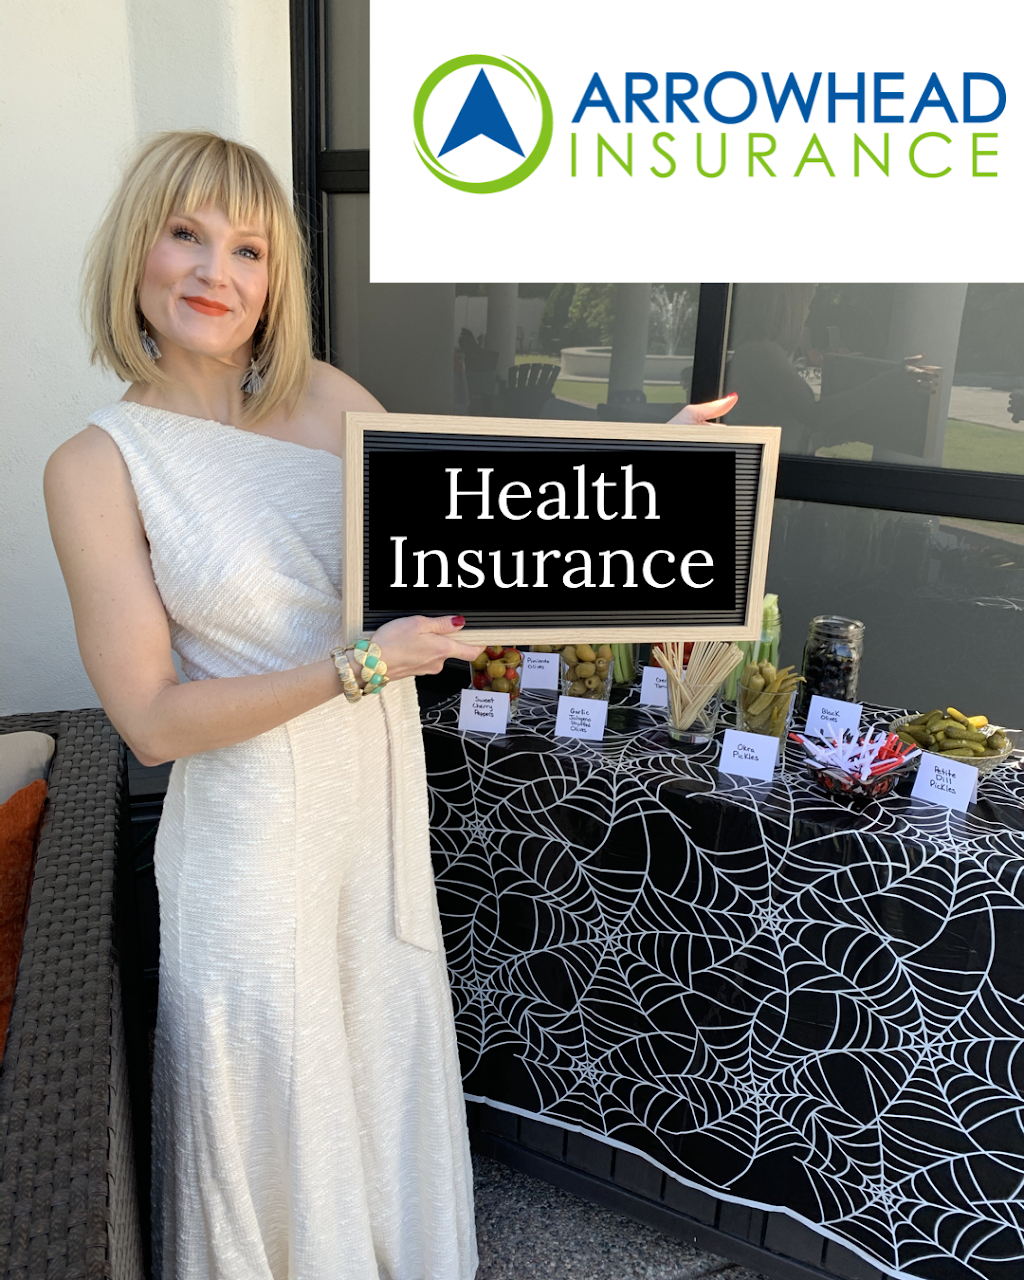 Arrowhead Insurance LLC - insurance agency  | Photo 4 of 10 | Address: 9844 W Yearling Rd UNIT 1160, Peoria, AZ 85383, USA | Phone: (623) 572-0032